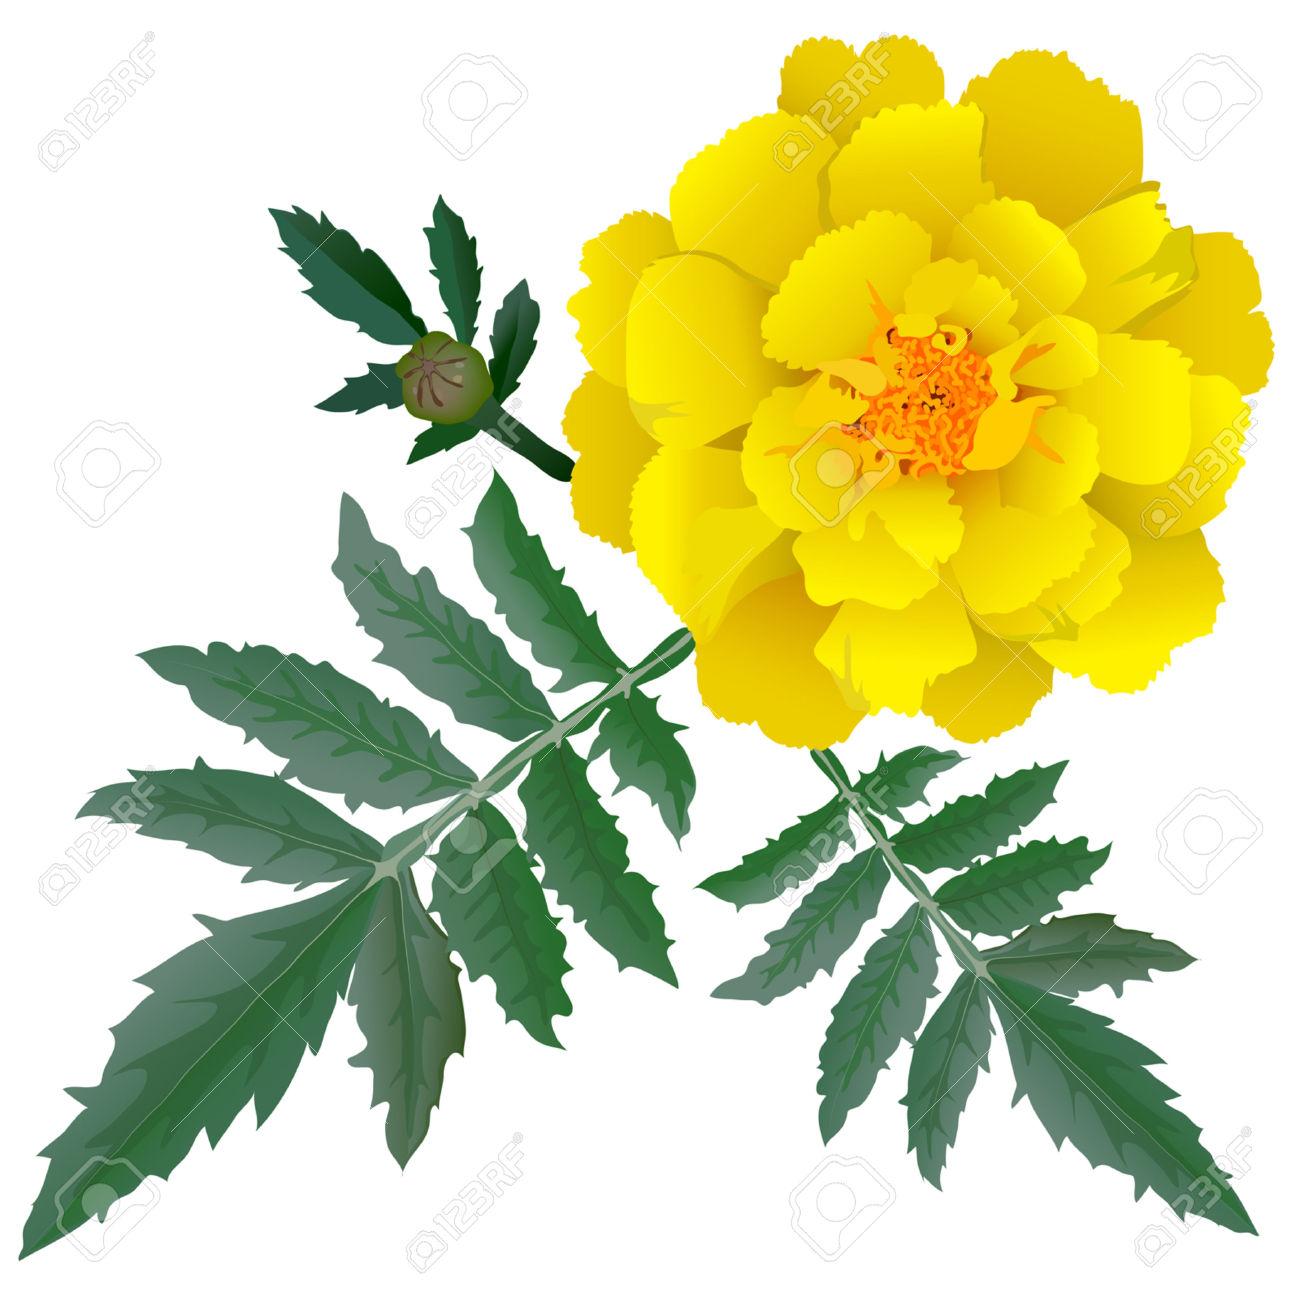 Yellow Marigolds Clip Art.